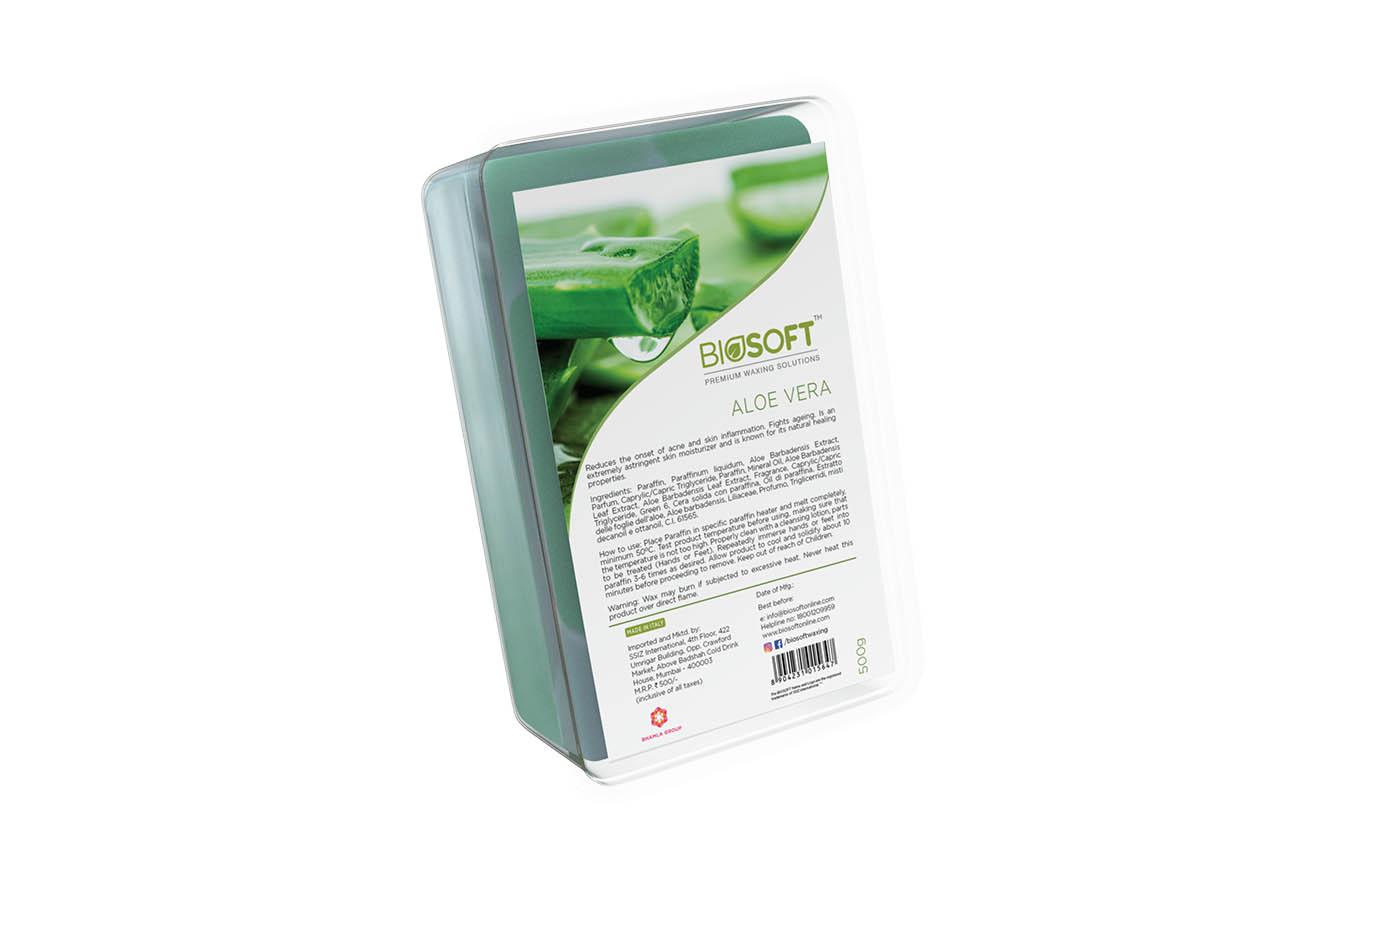 Healthy and nourishing skin with Biosoft